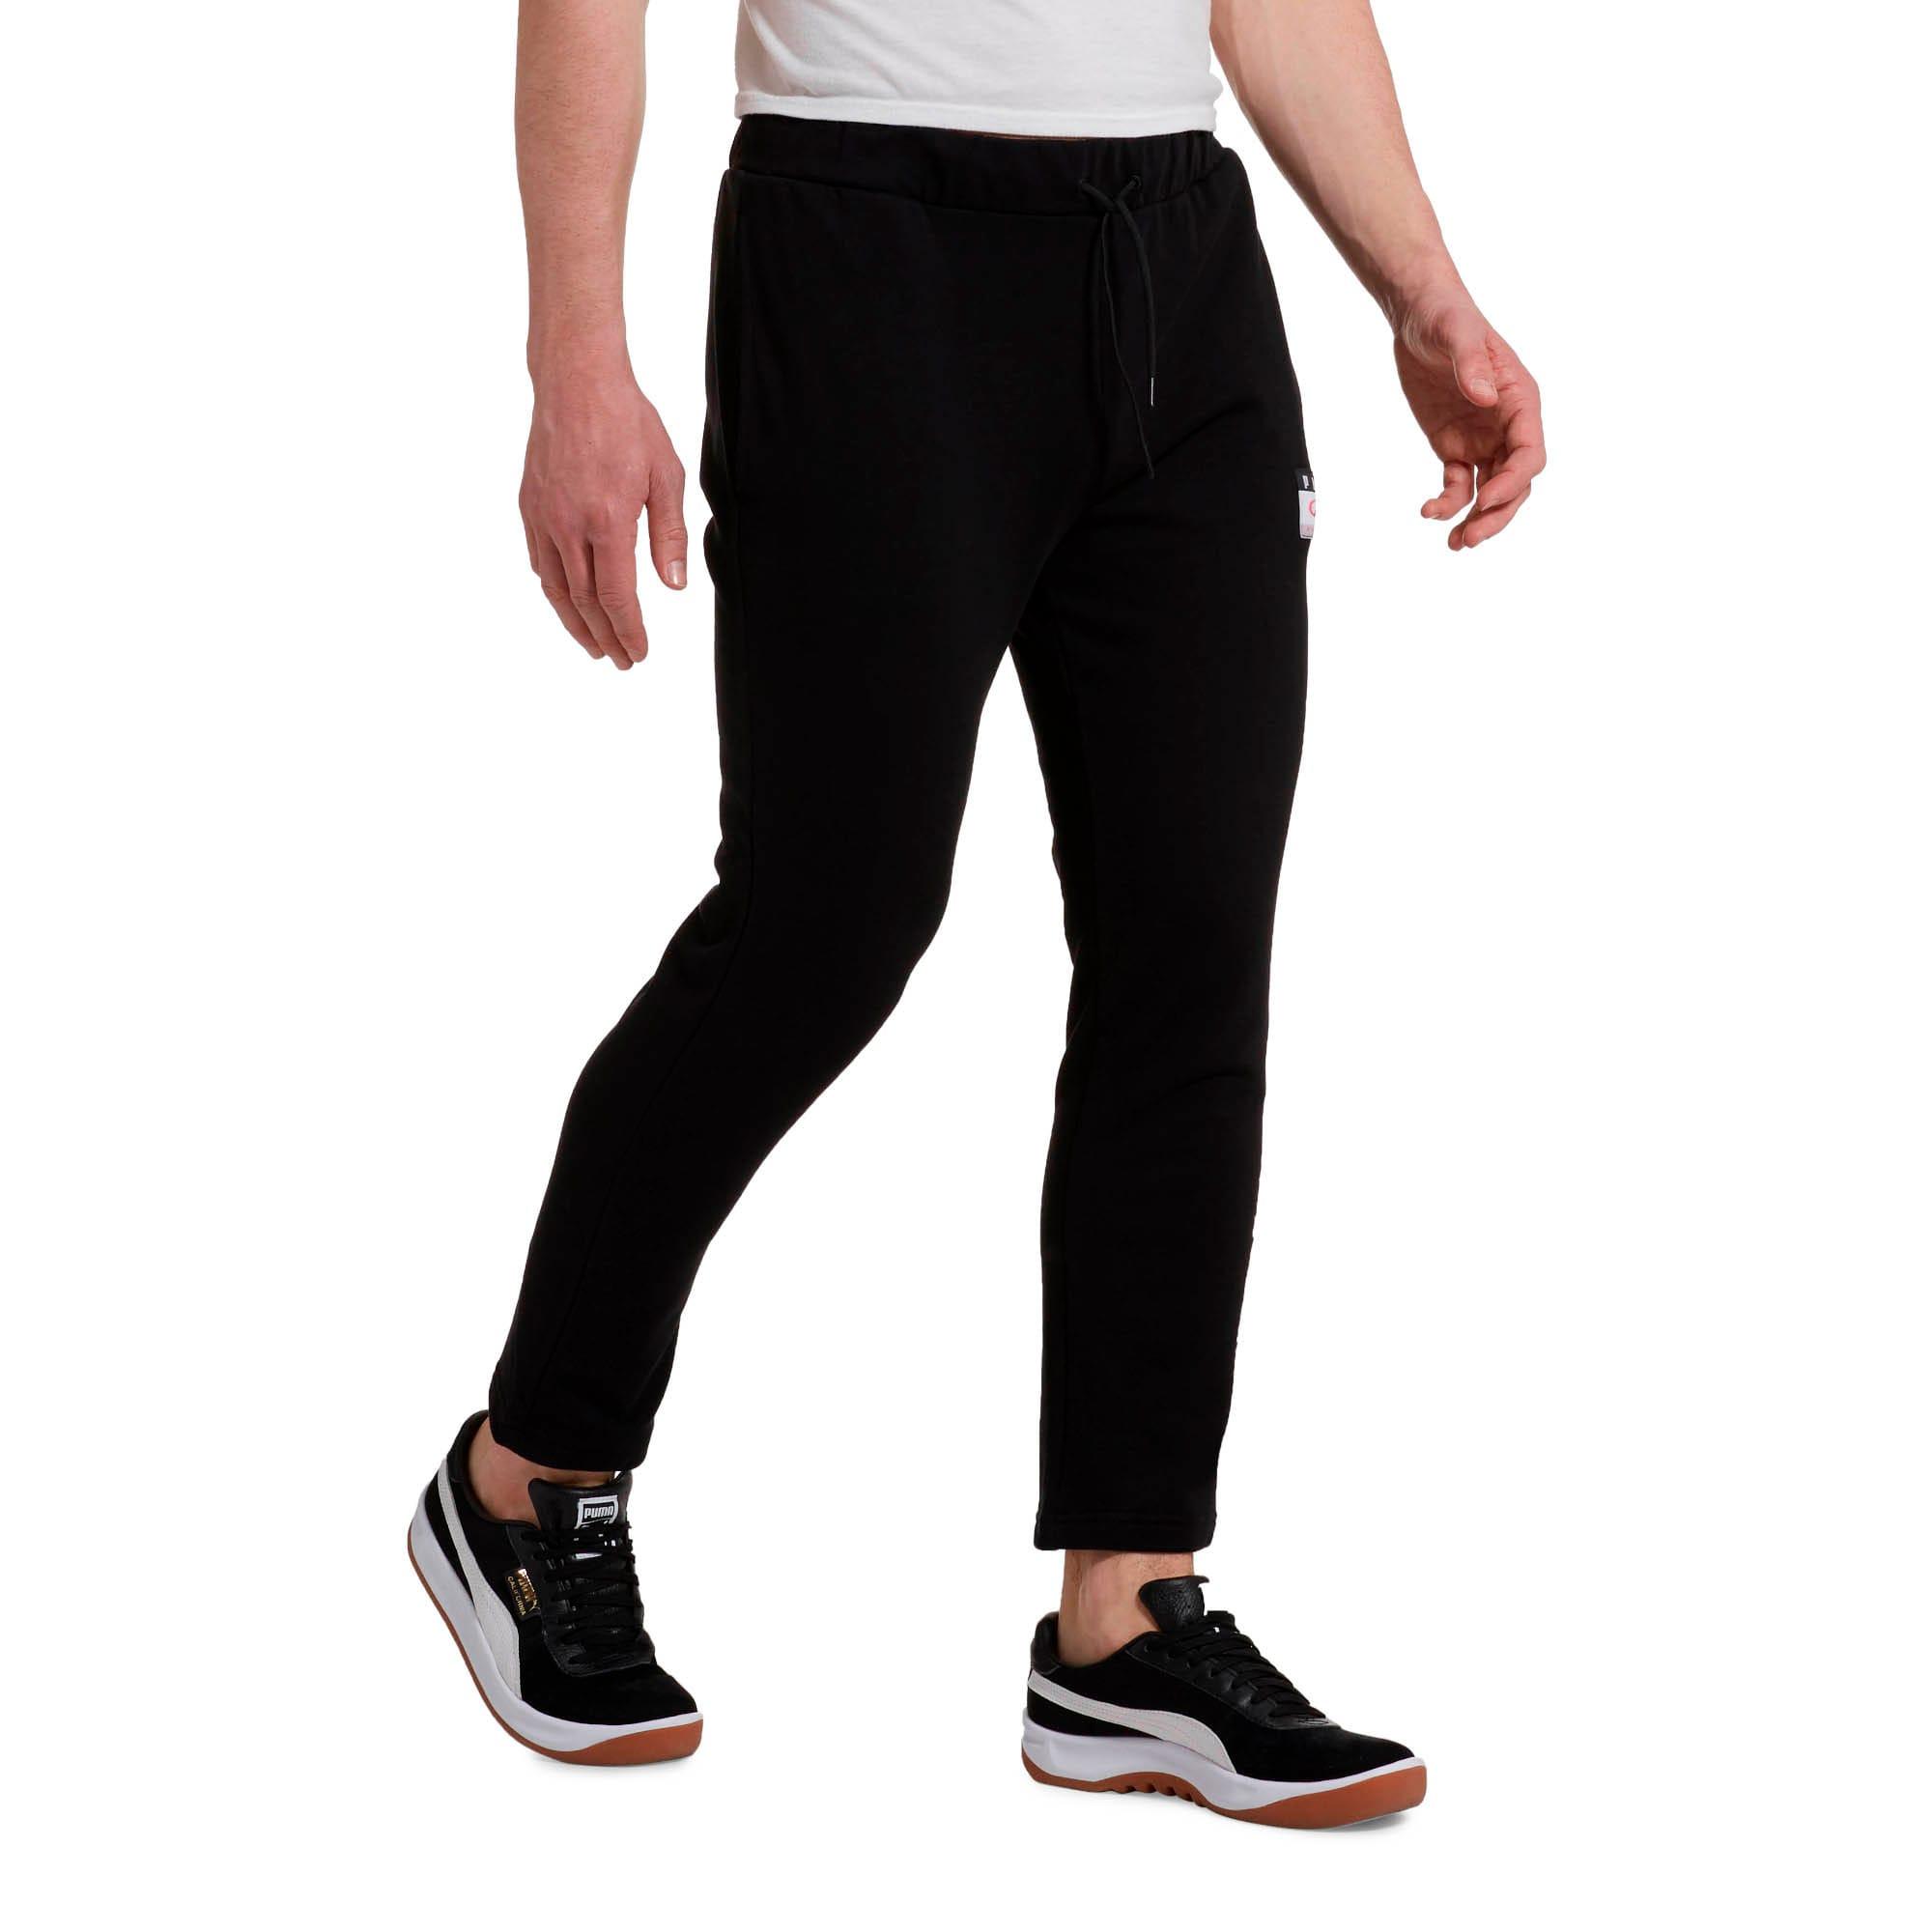 Thumbnail 1 of '90s Retro Men's Sweatpants, Cotton Black, medium